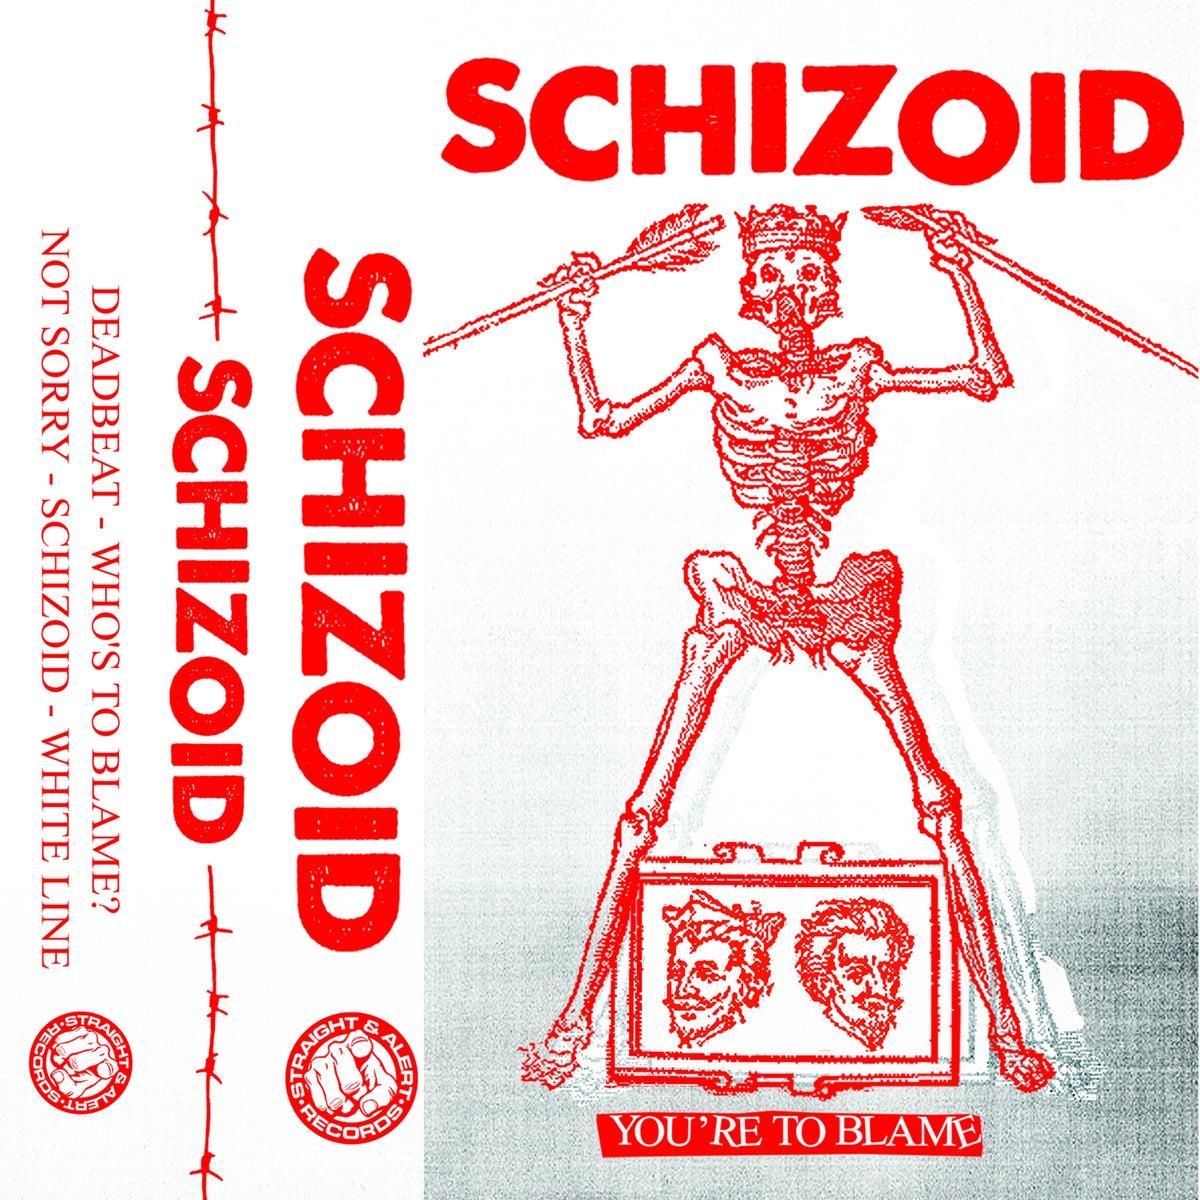 Schizoid - You're to blame CS